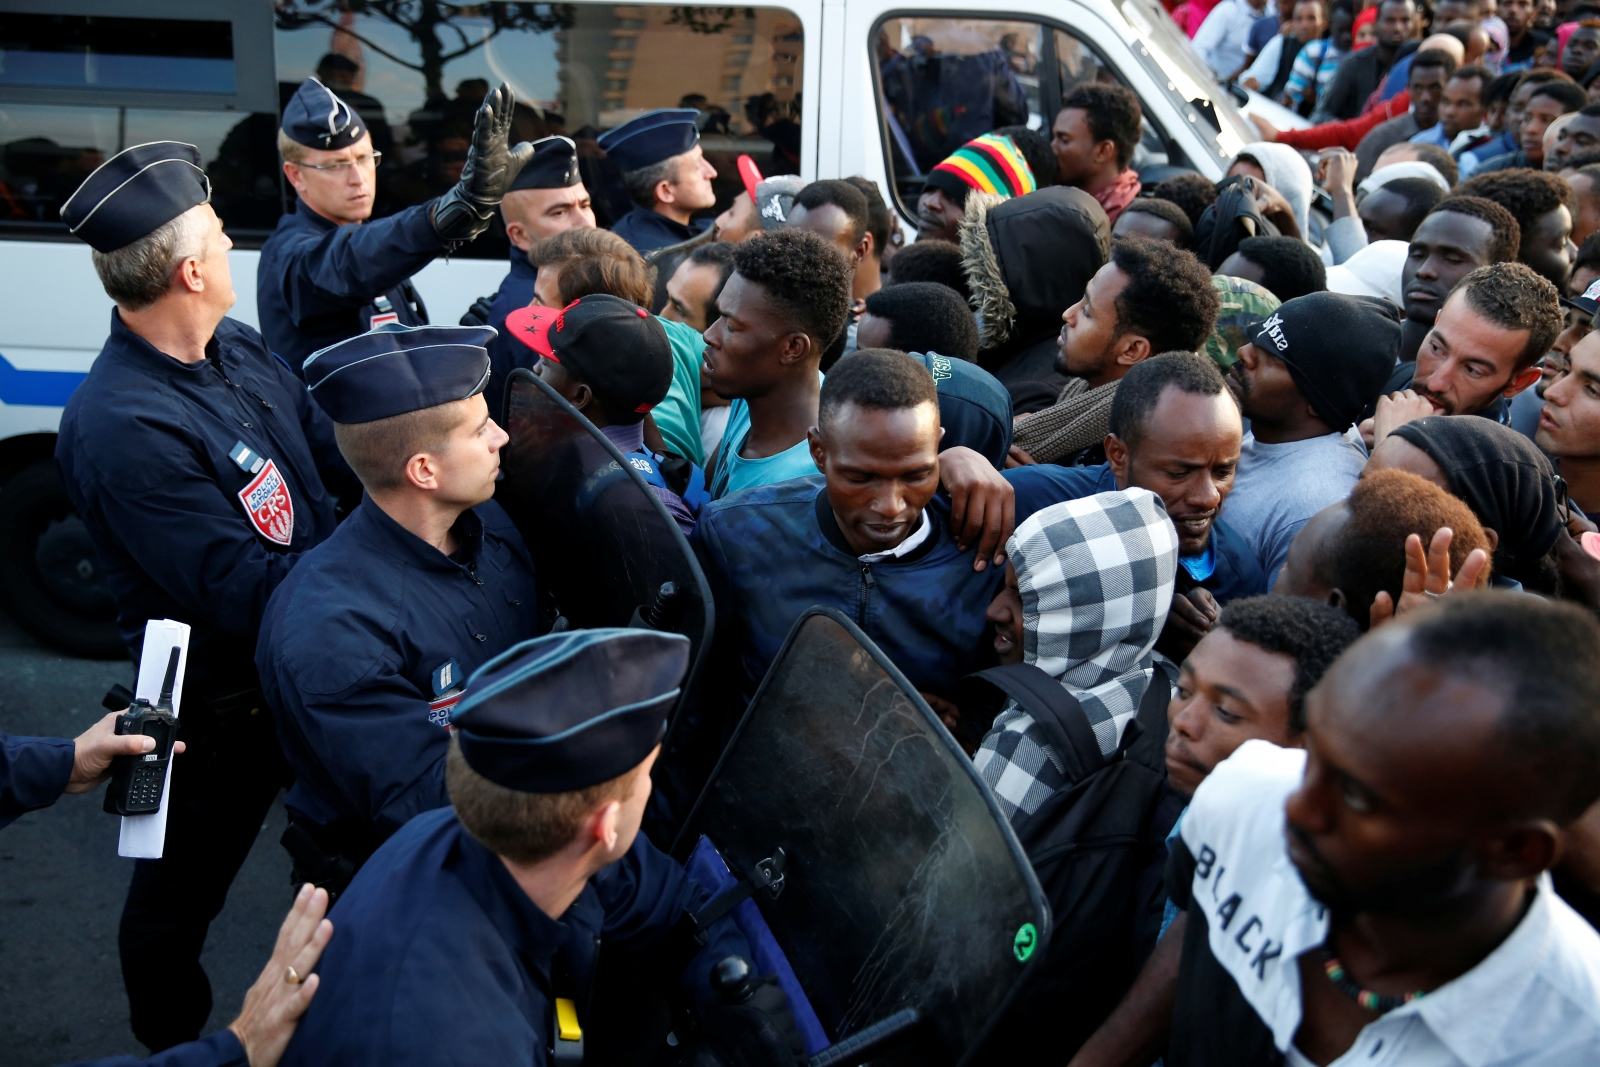 French police migrants Paris